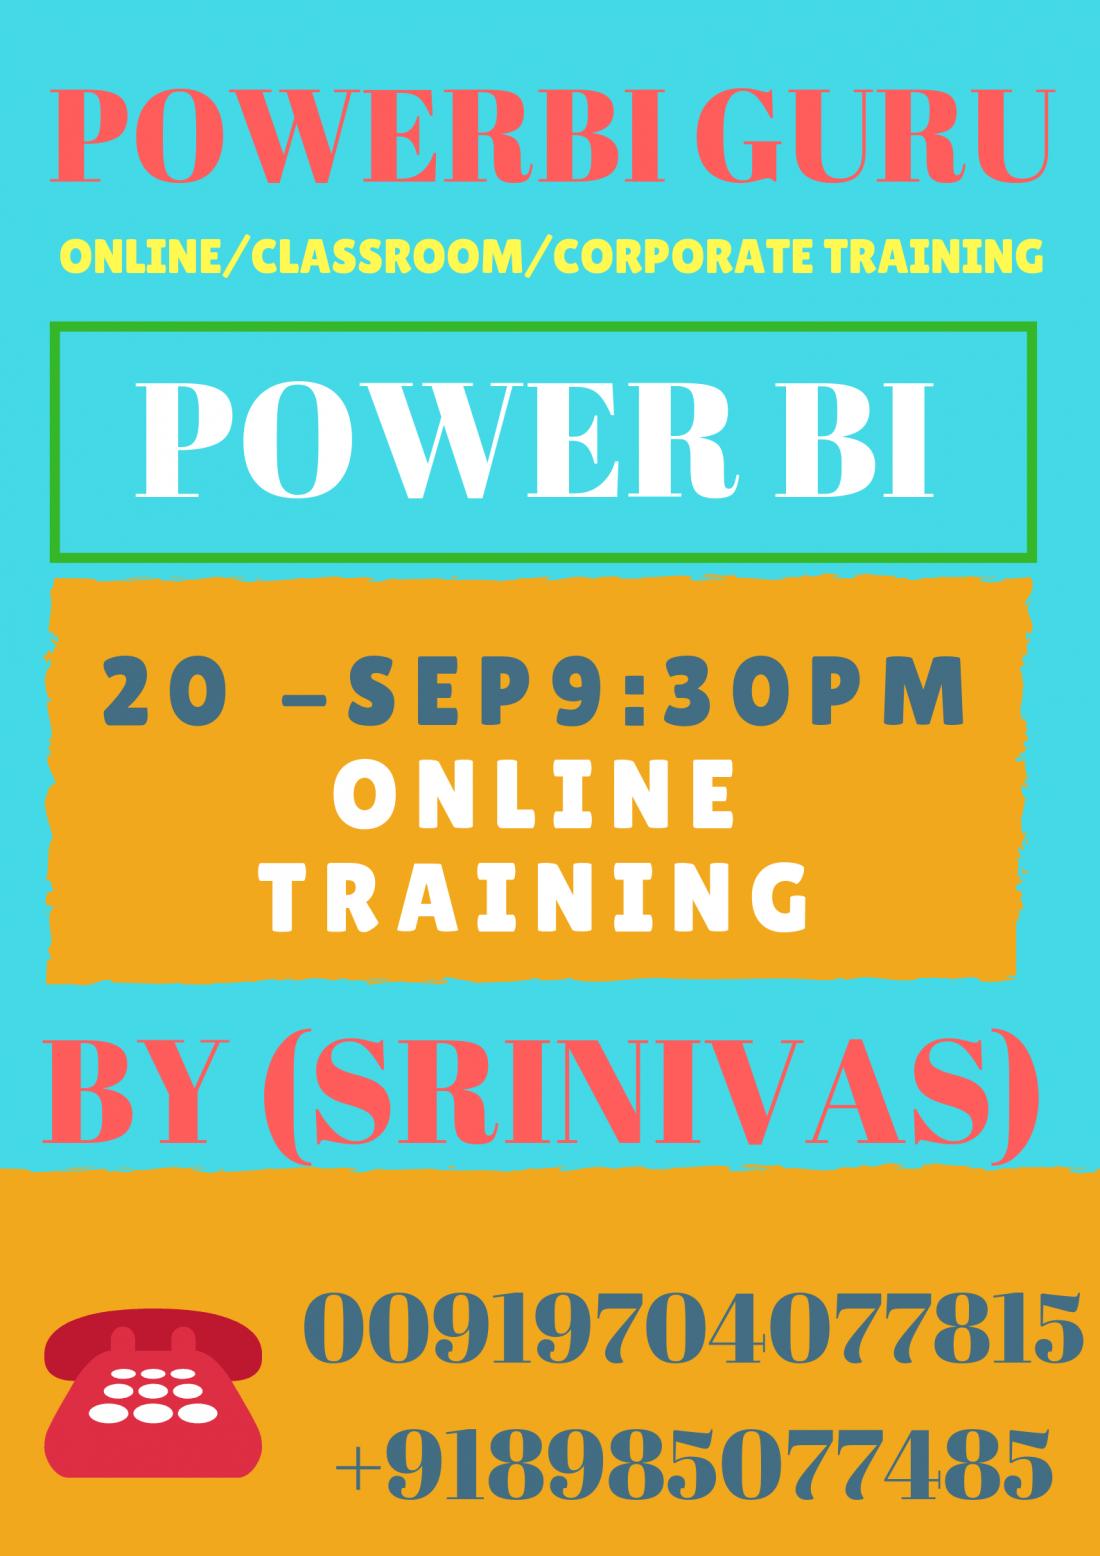 Powerbi Guru Online Classes At Hyderabad Hyderabad